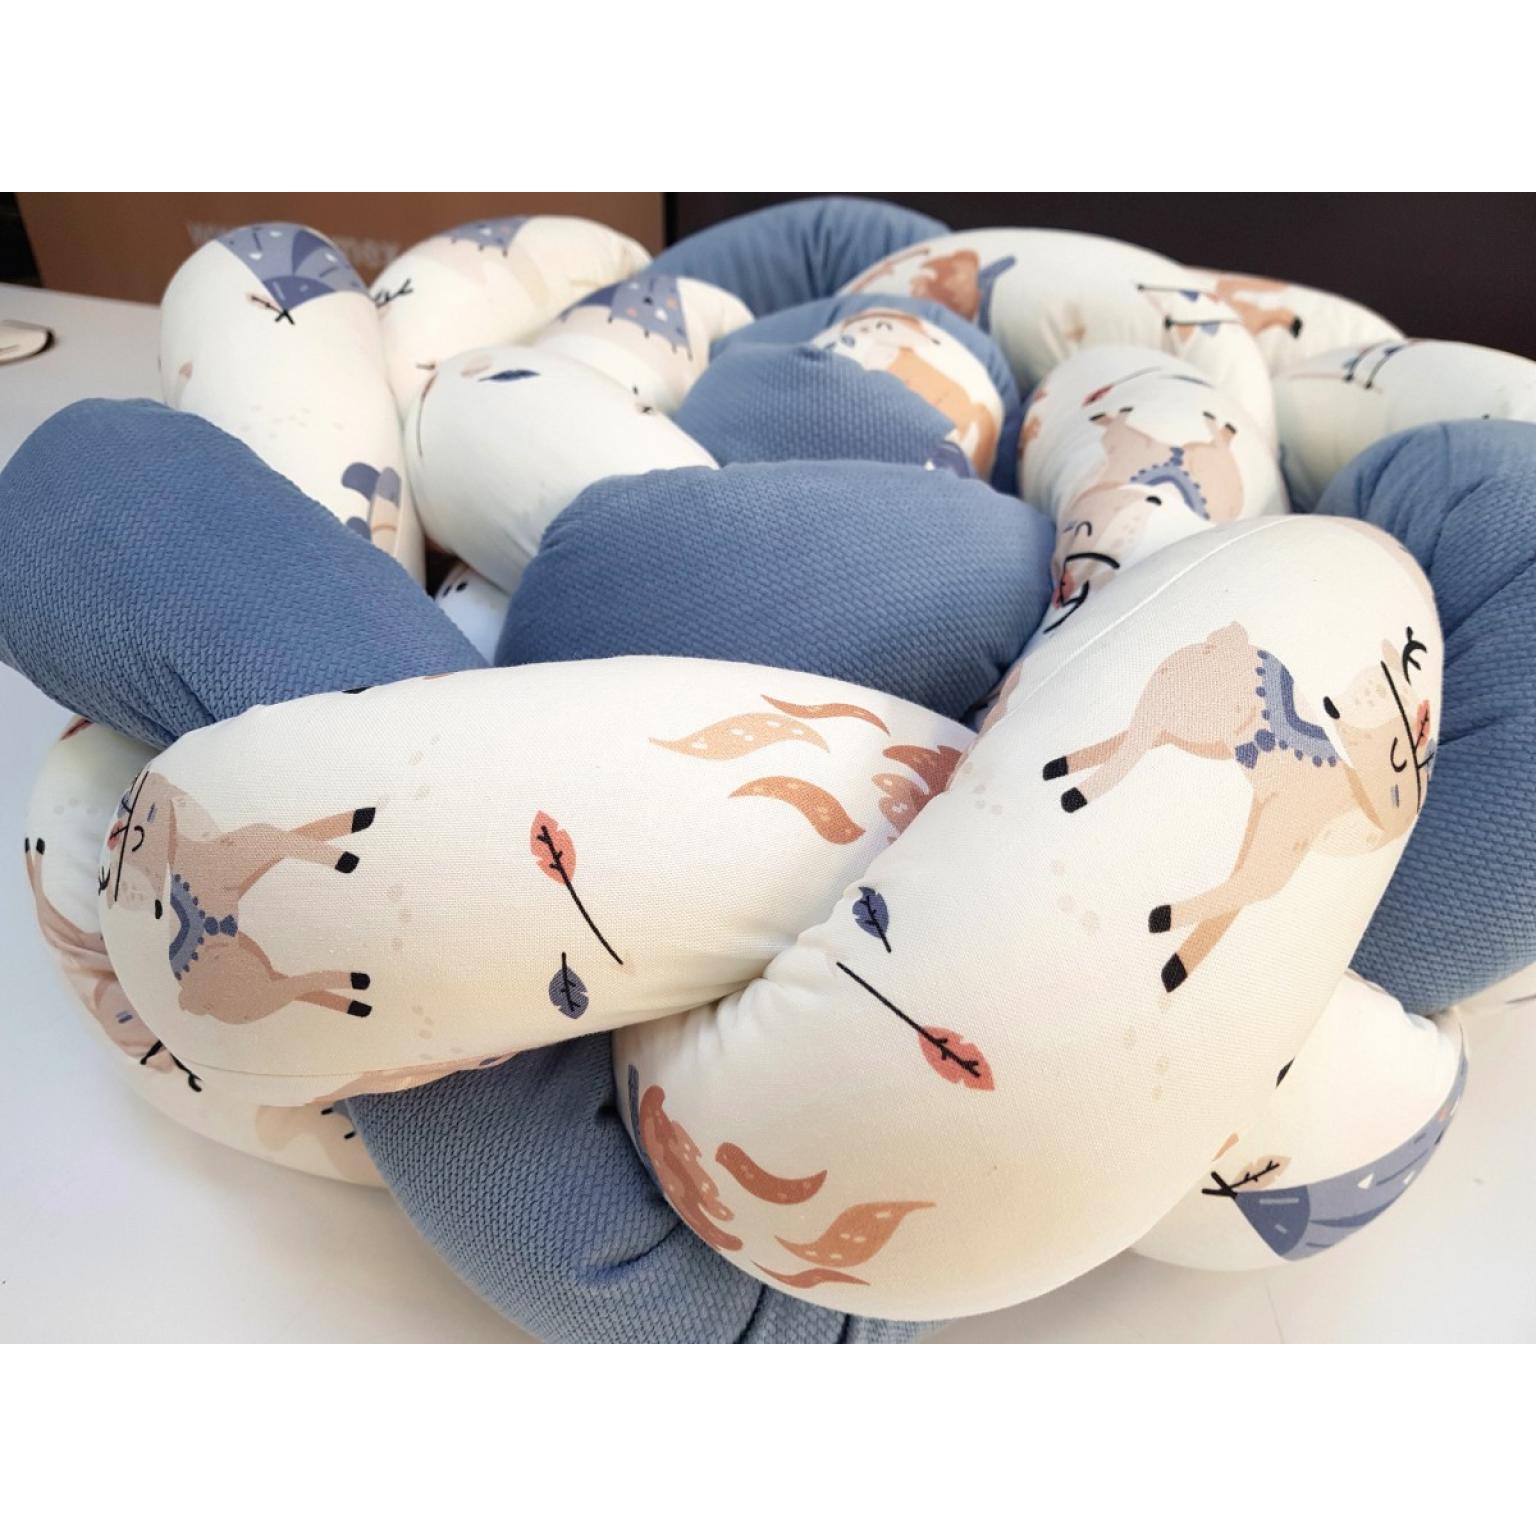 Pīta-gultas-apmale-bizīte-PUER-exclusive-Vigvam-blue-(2)